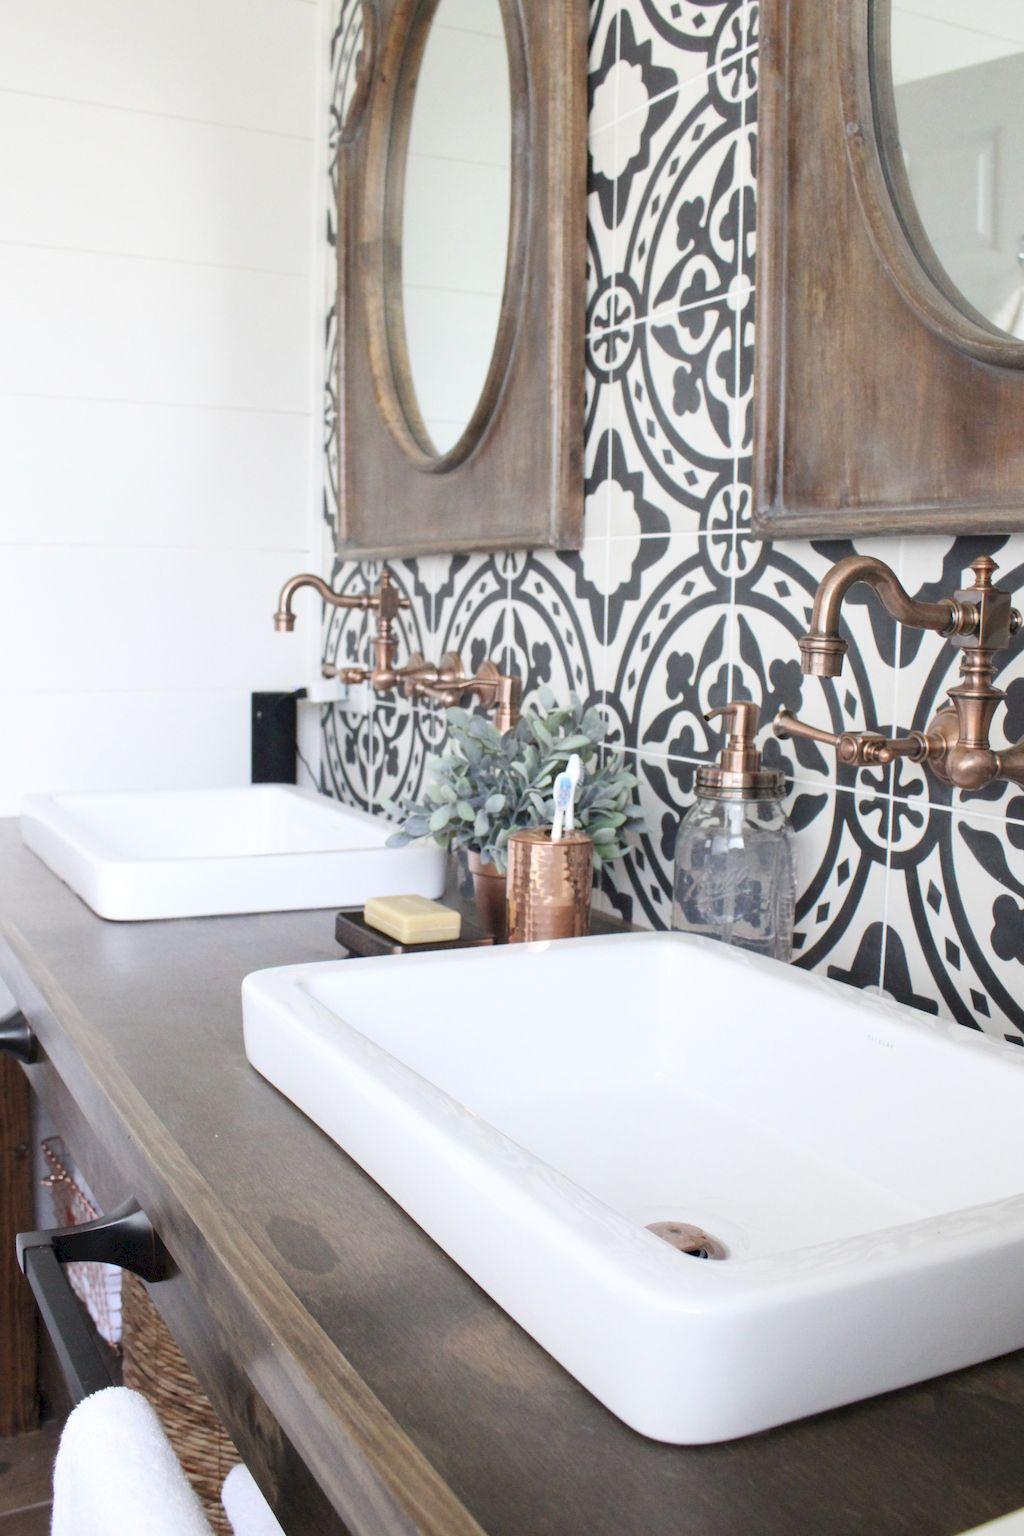 Vintage badezimmer design vintage farmhouse bathroom remodel ideas on a budget   bath